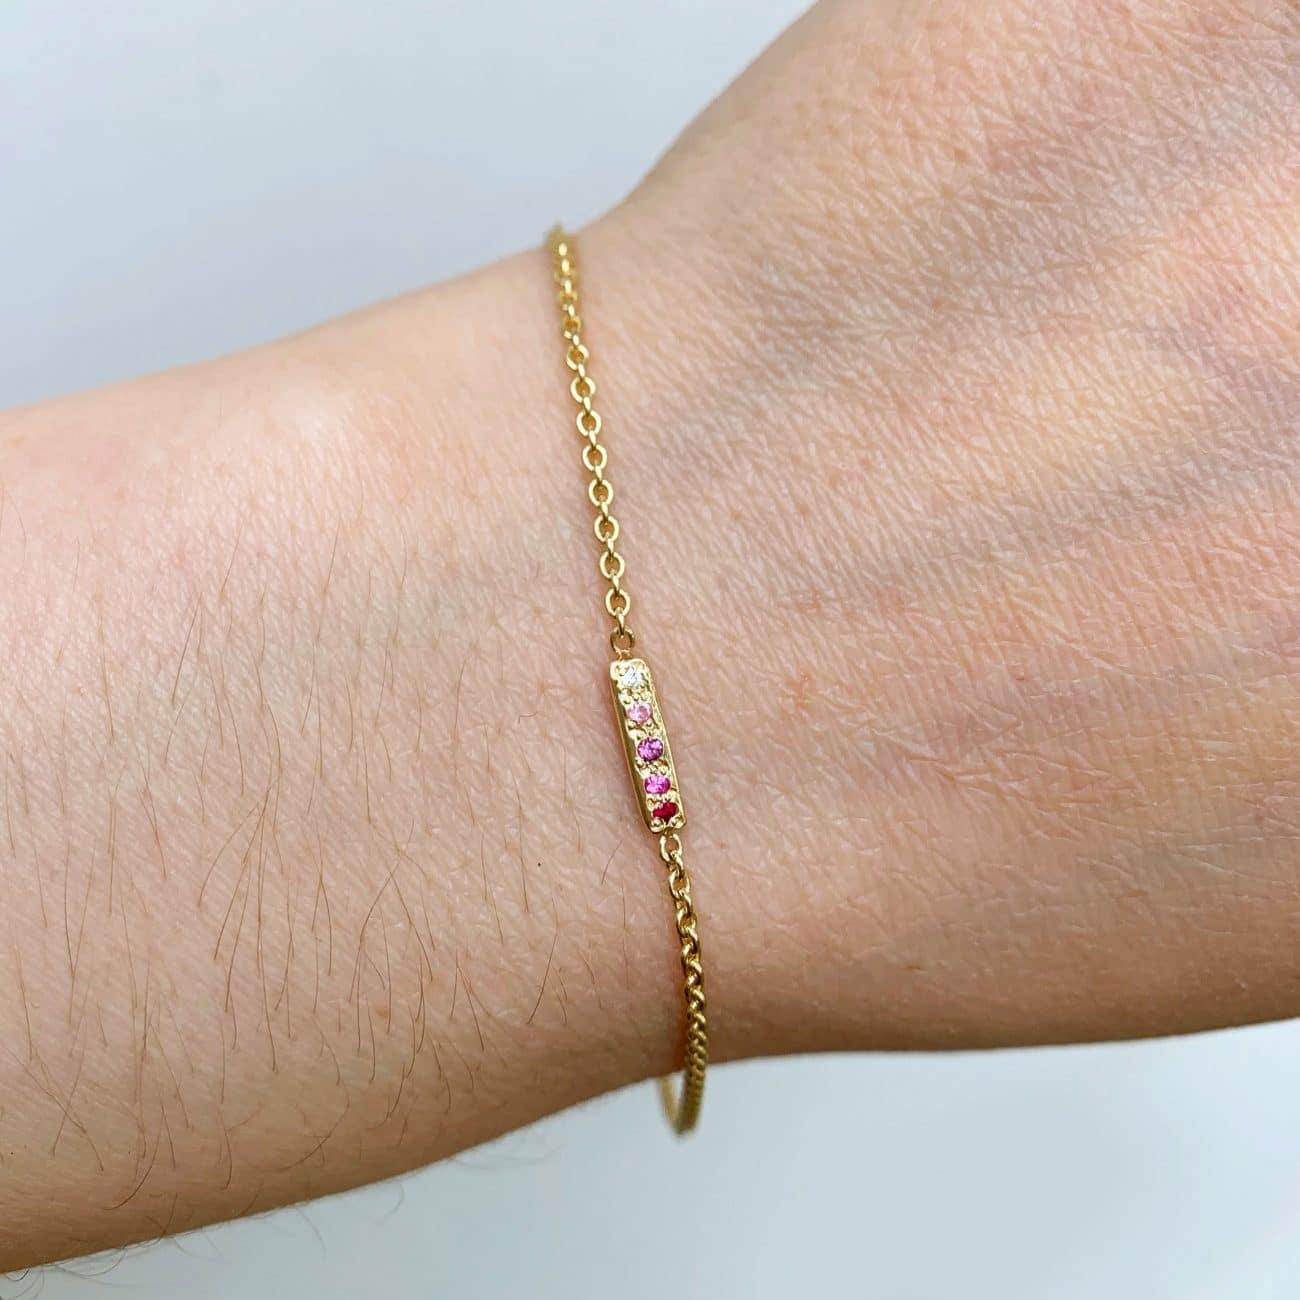 wearing the skinny bar bracelet in 14k yellow gold